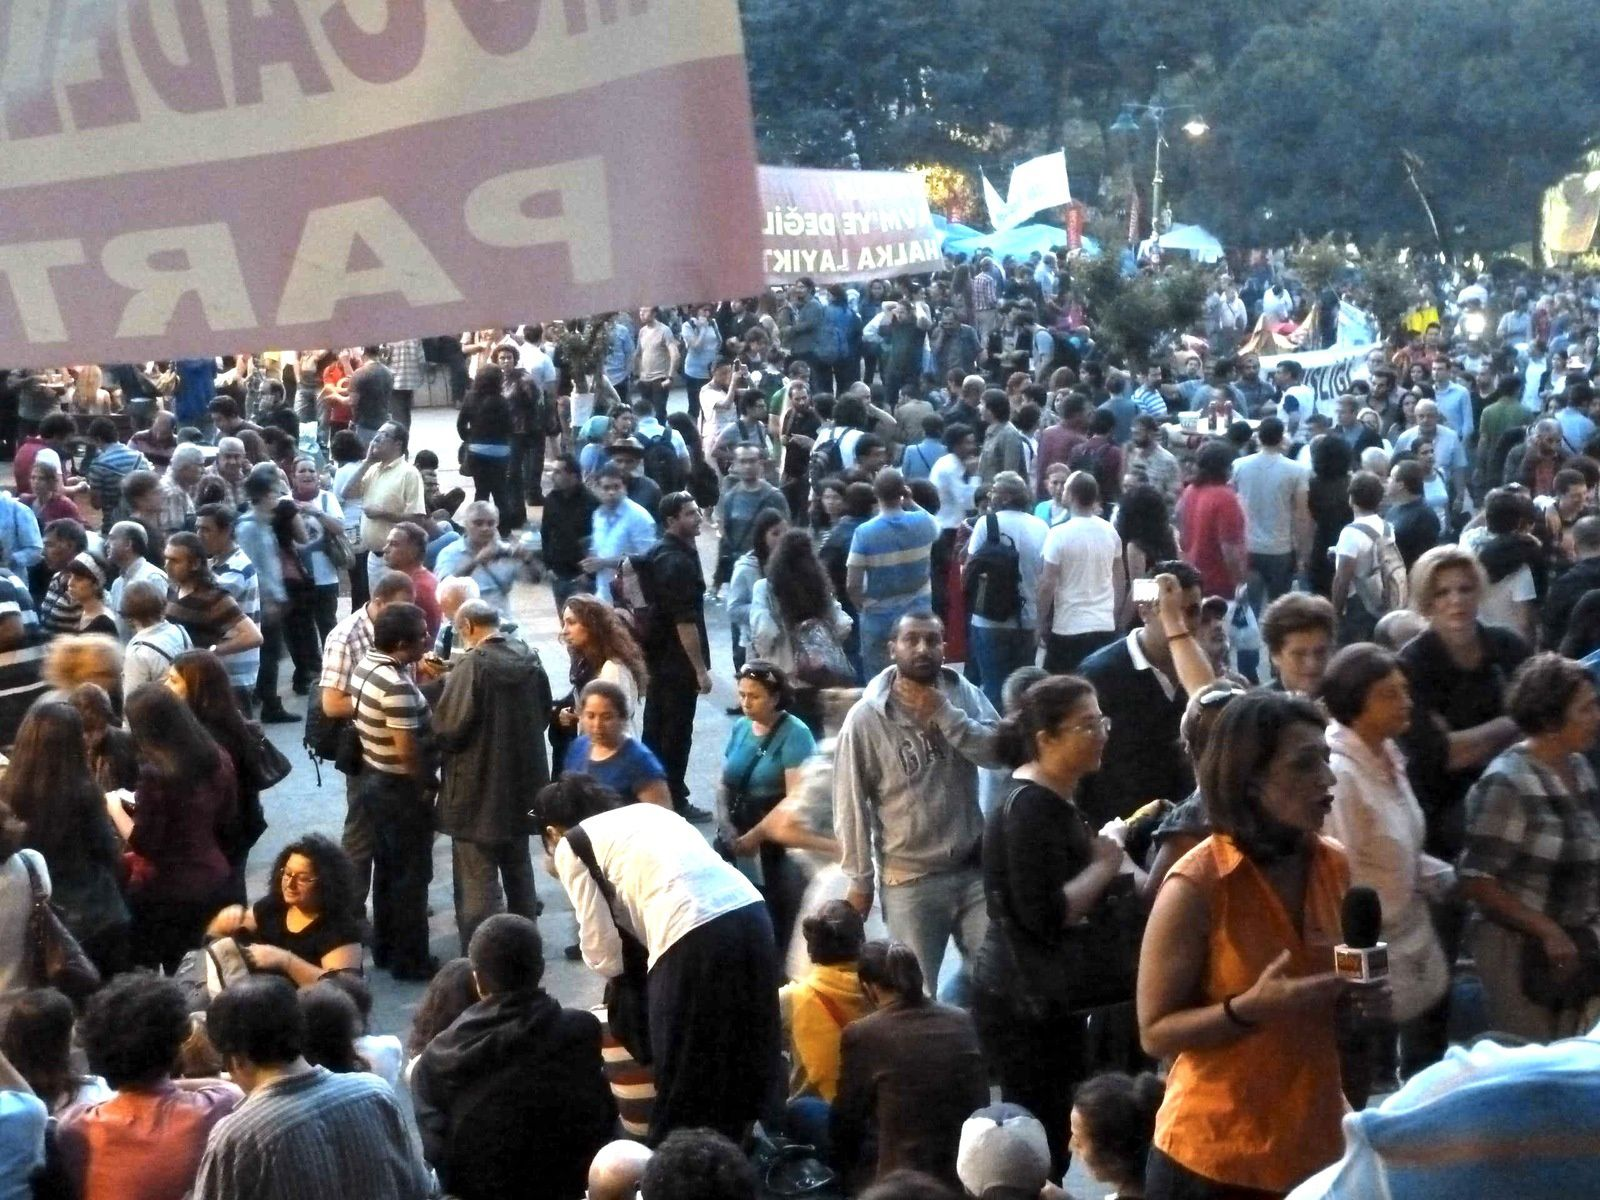 Taksim, vendredi 14 juin 2013 au soir. Photo E.C.